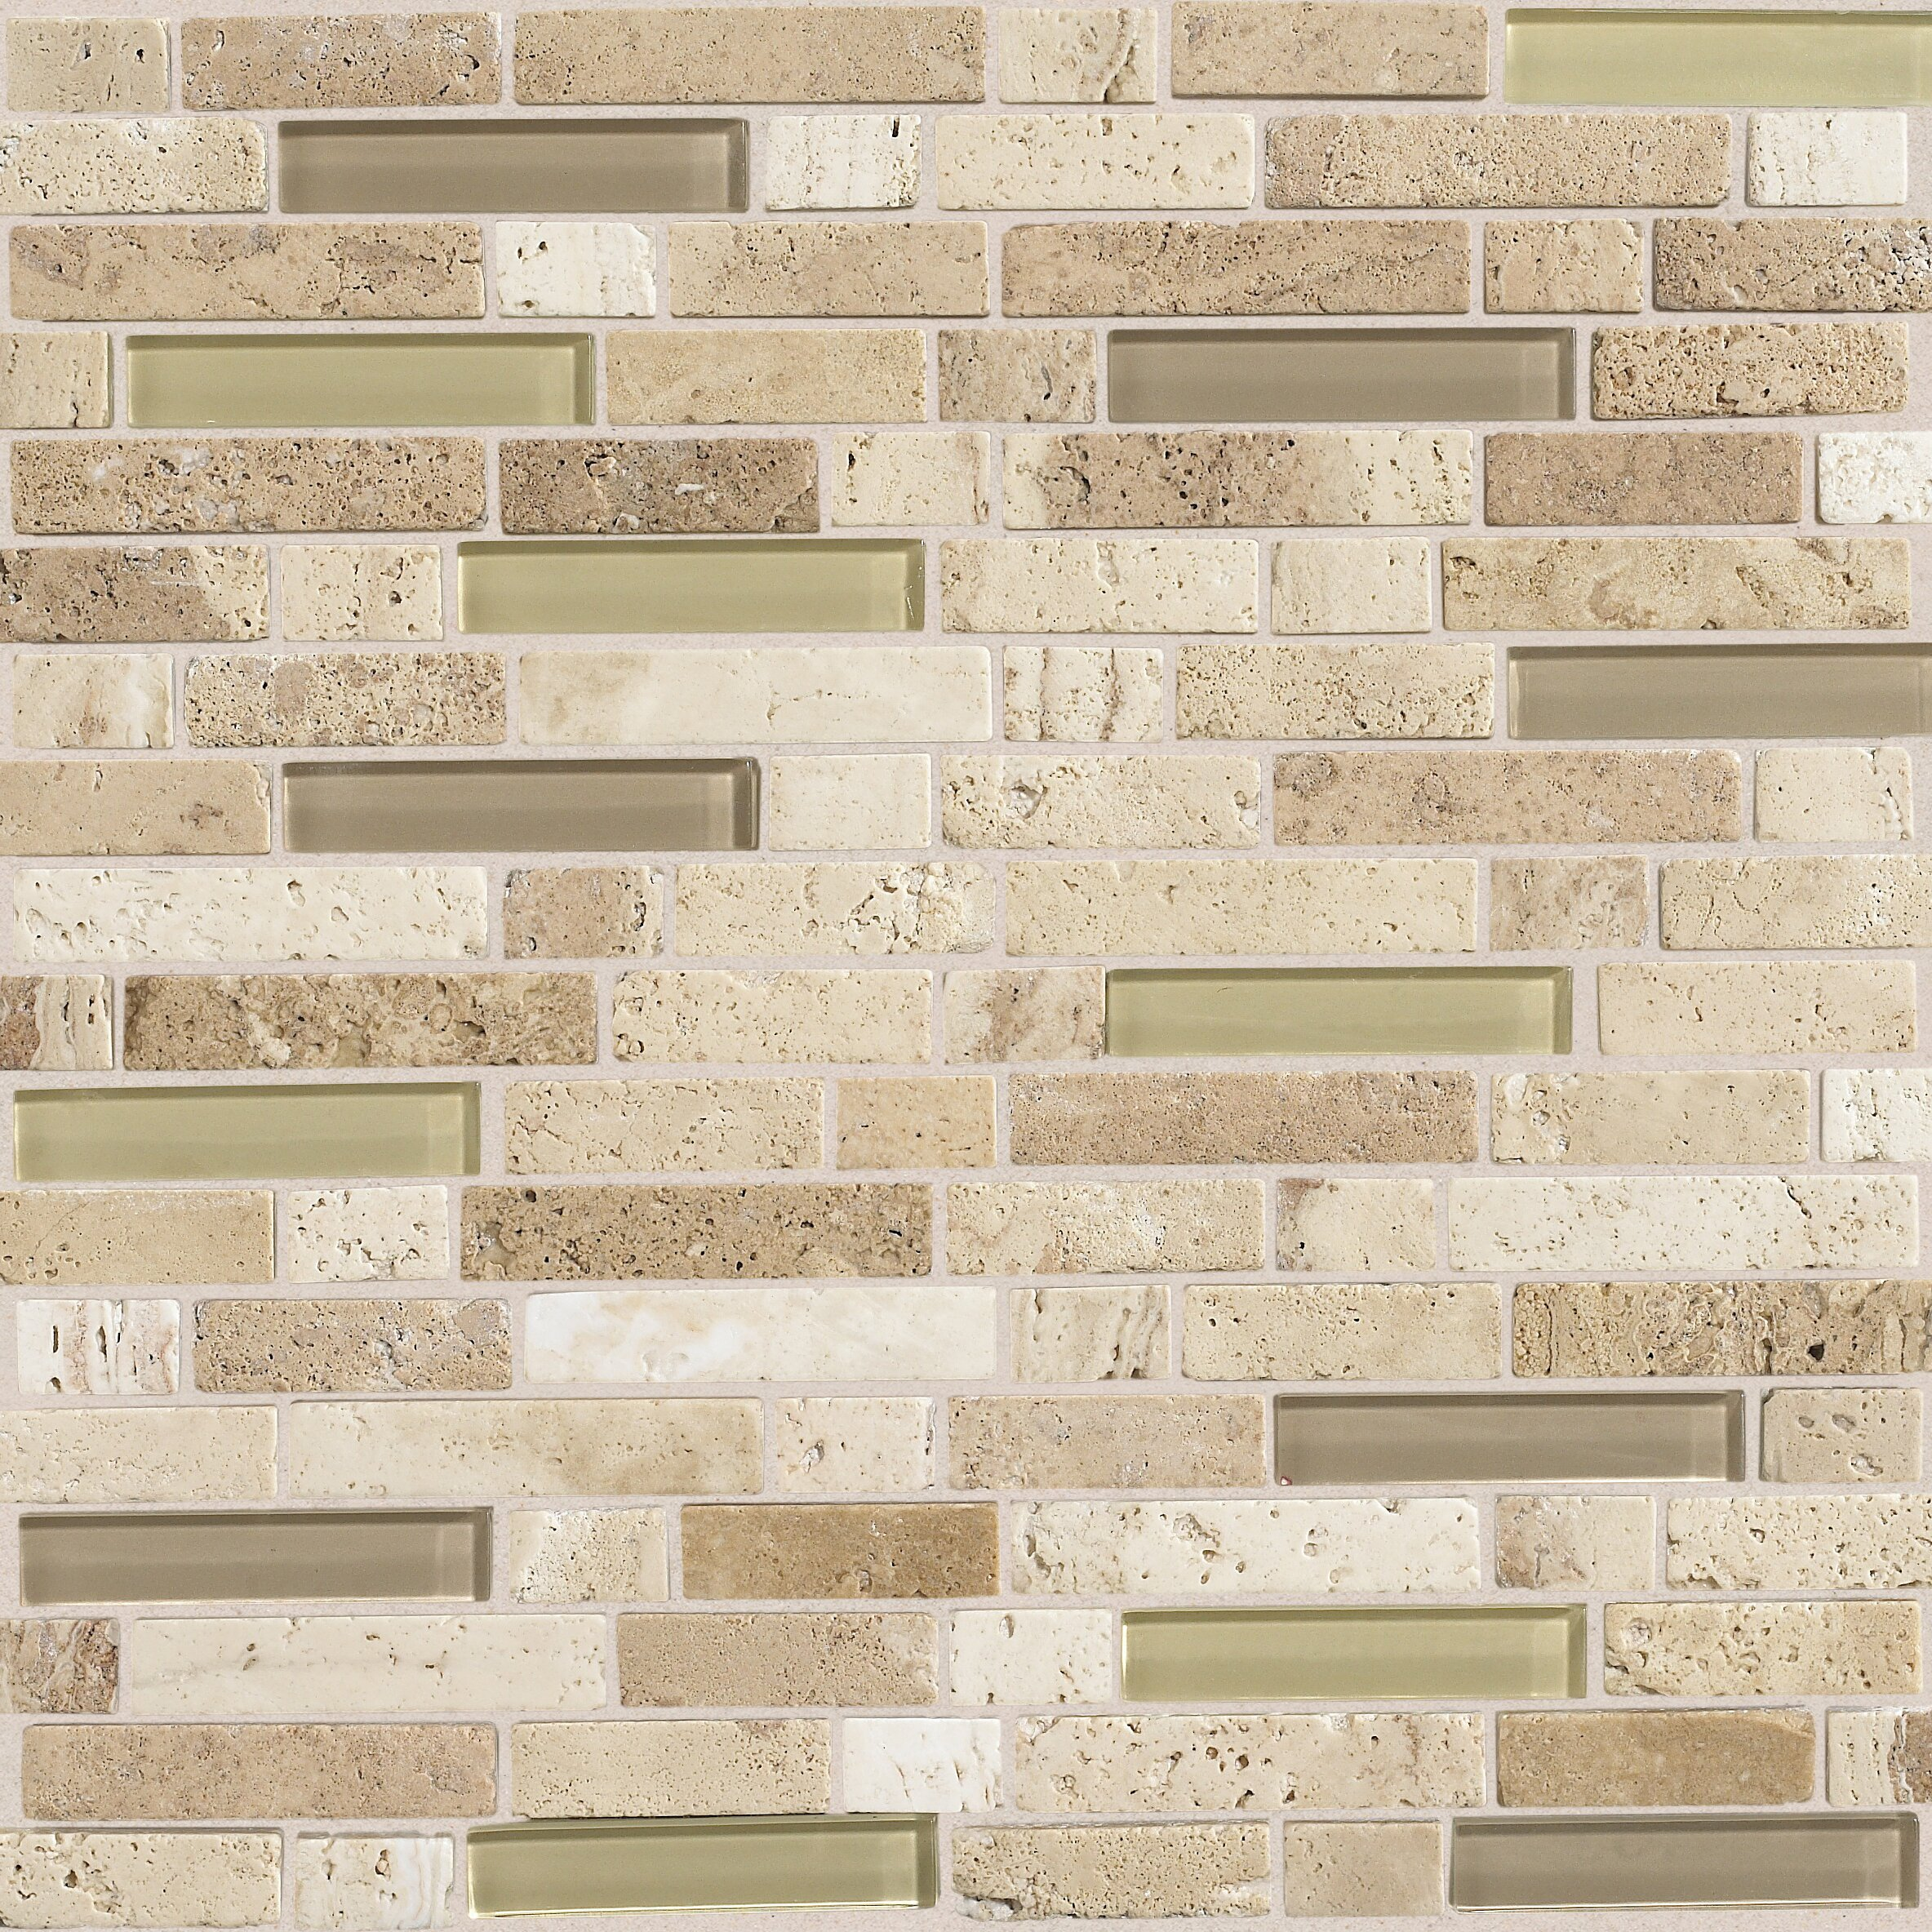 Daltile Stone Radiance Random Sized Slate Mosaic Tile in